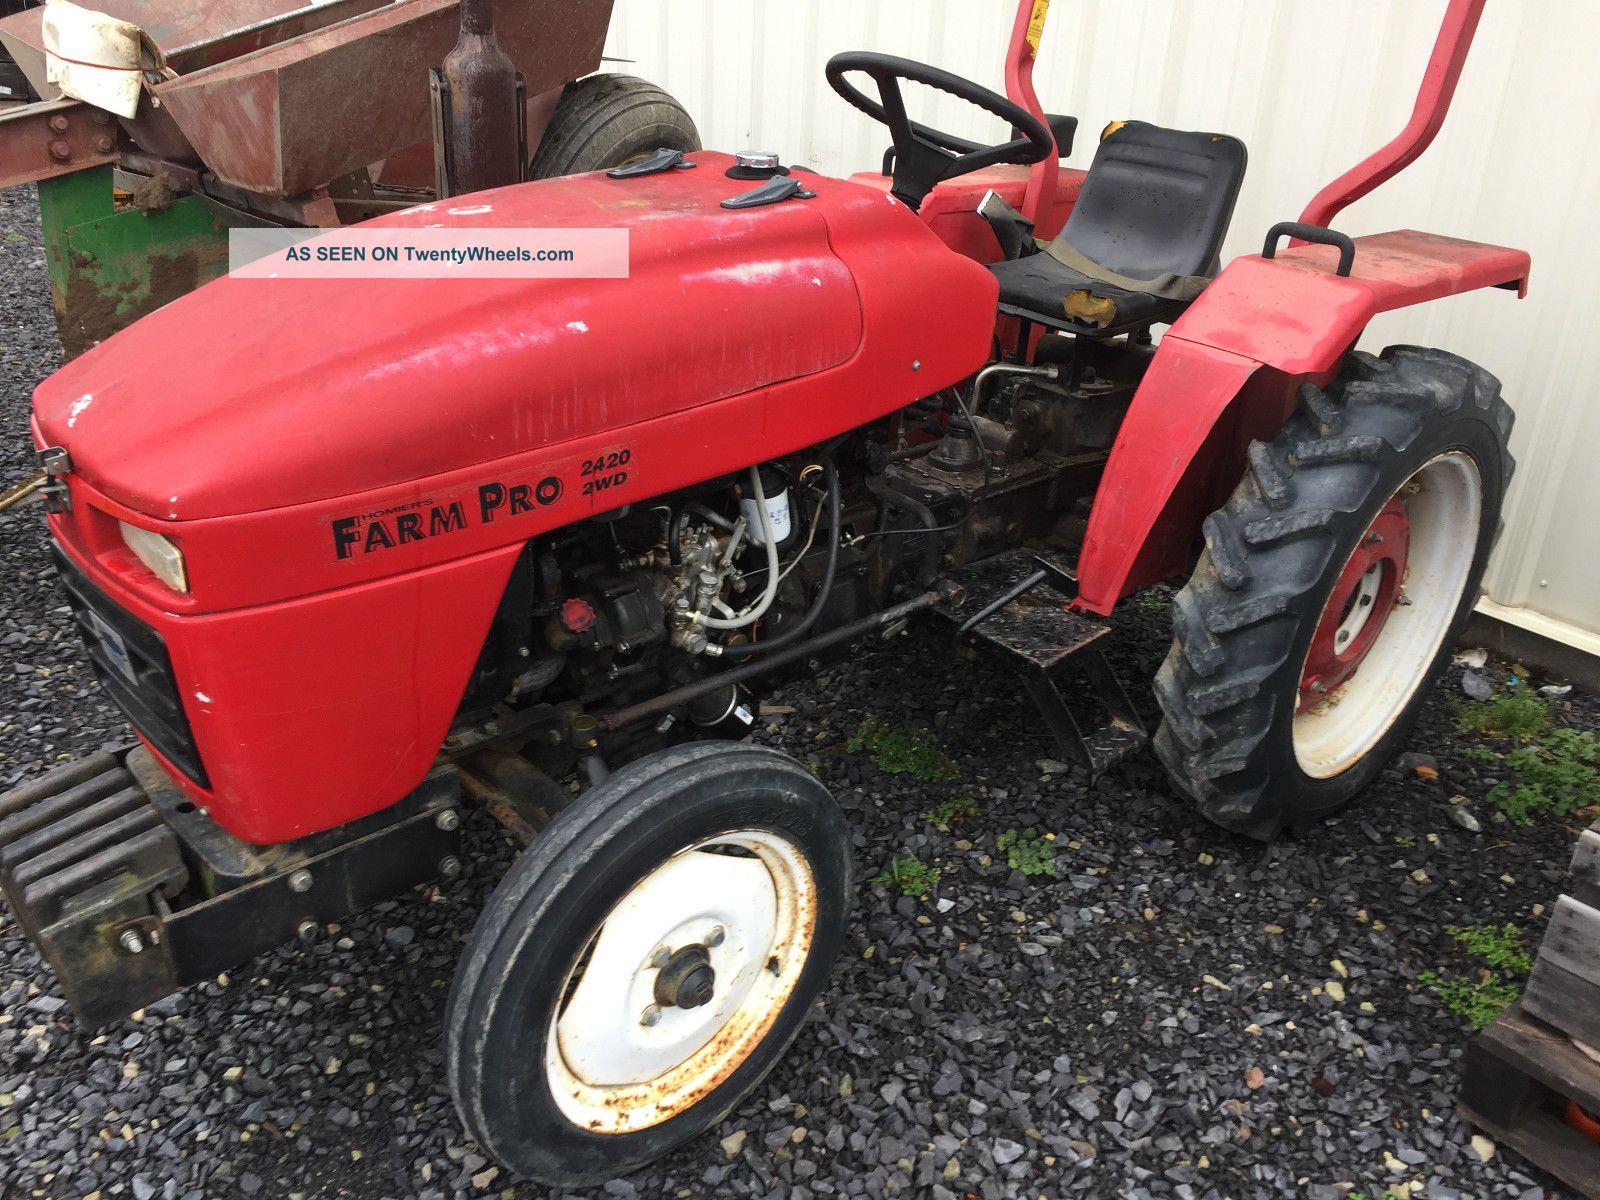 Small Tractors With Pto : Farm pro diesel compact tractor pt pto rubber